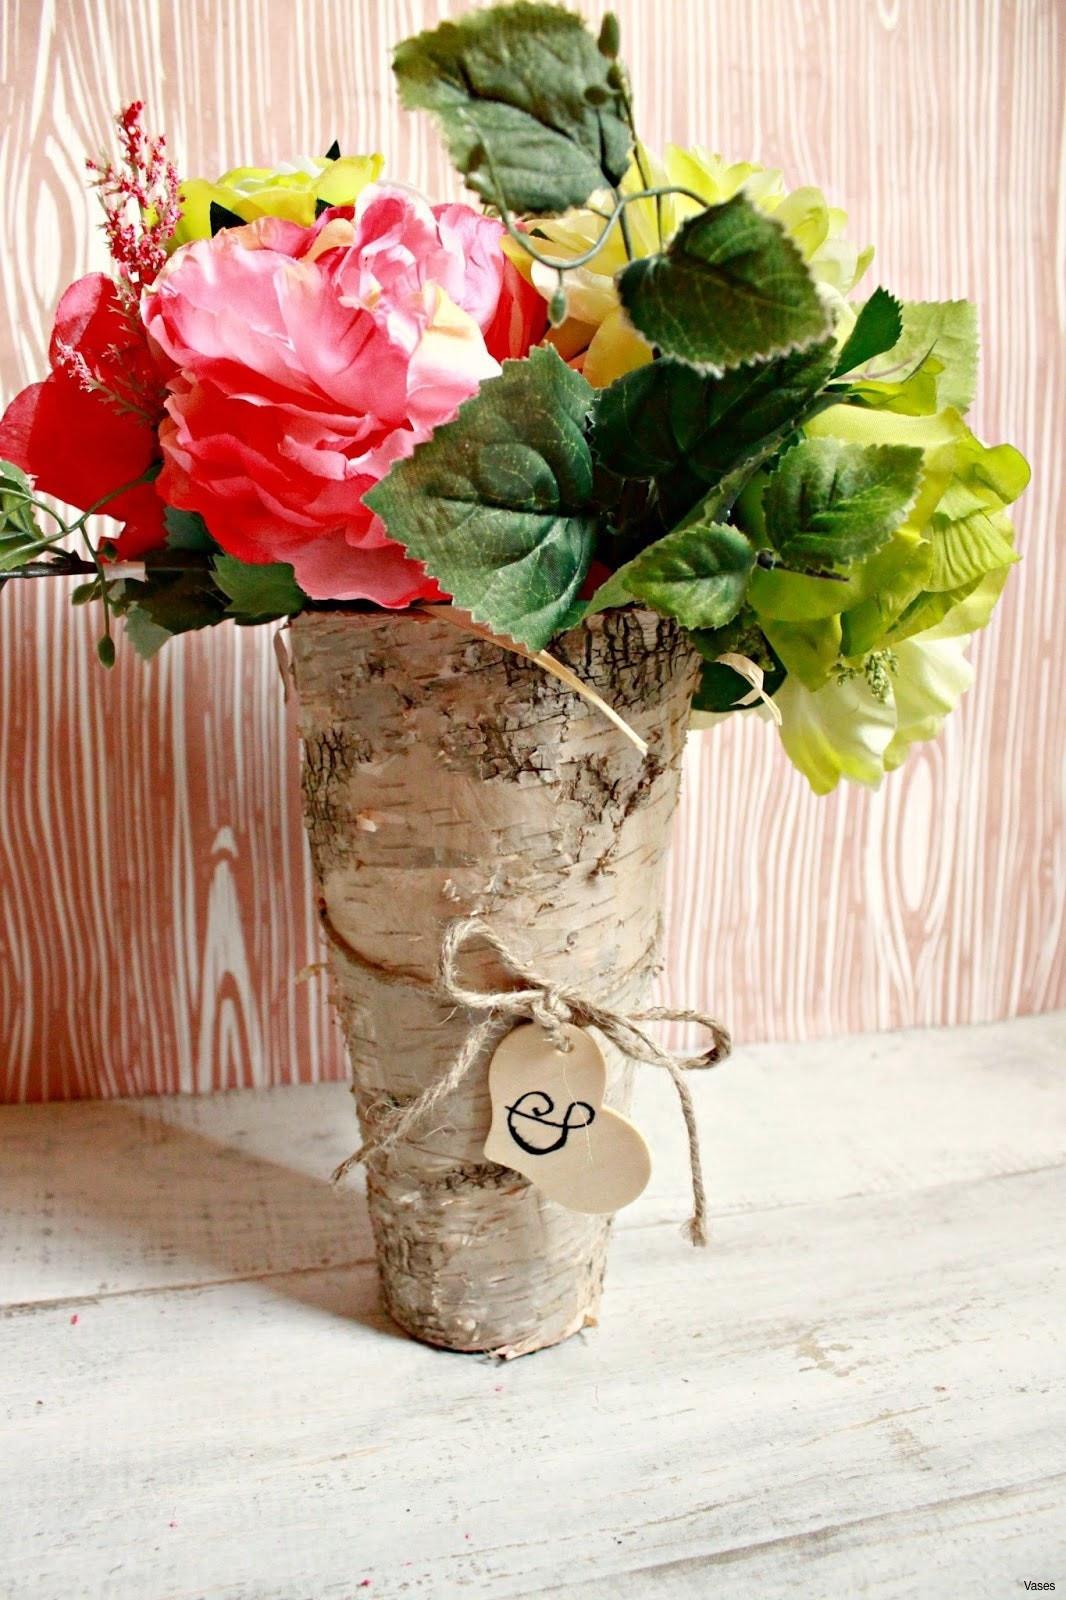 wholesale unique vases of 20 new flowers arrangements supplies flower decoration ideas throughout flowers arrangements supplies elegant h vases diy wood vase i 0d base turntable baseboard design ideas